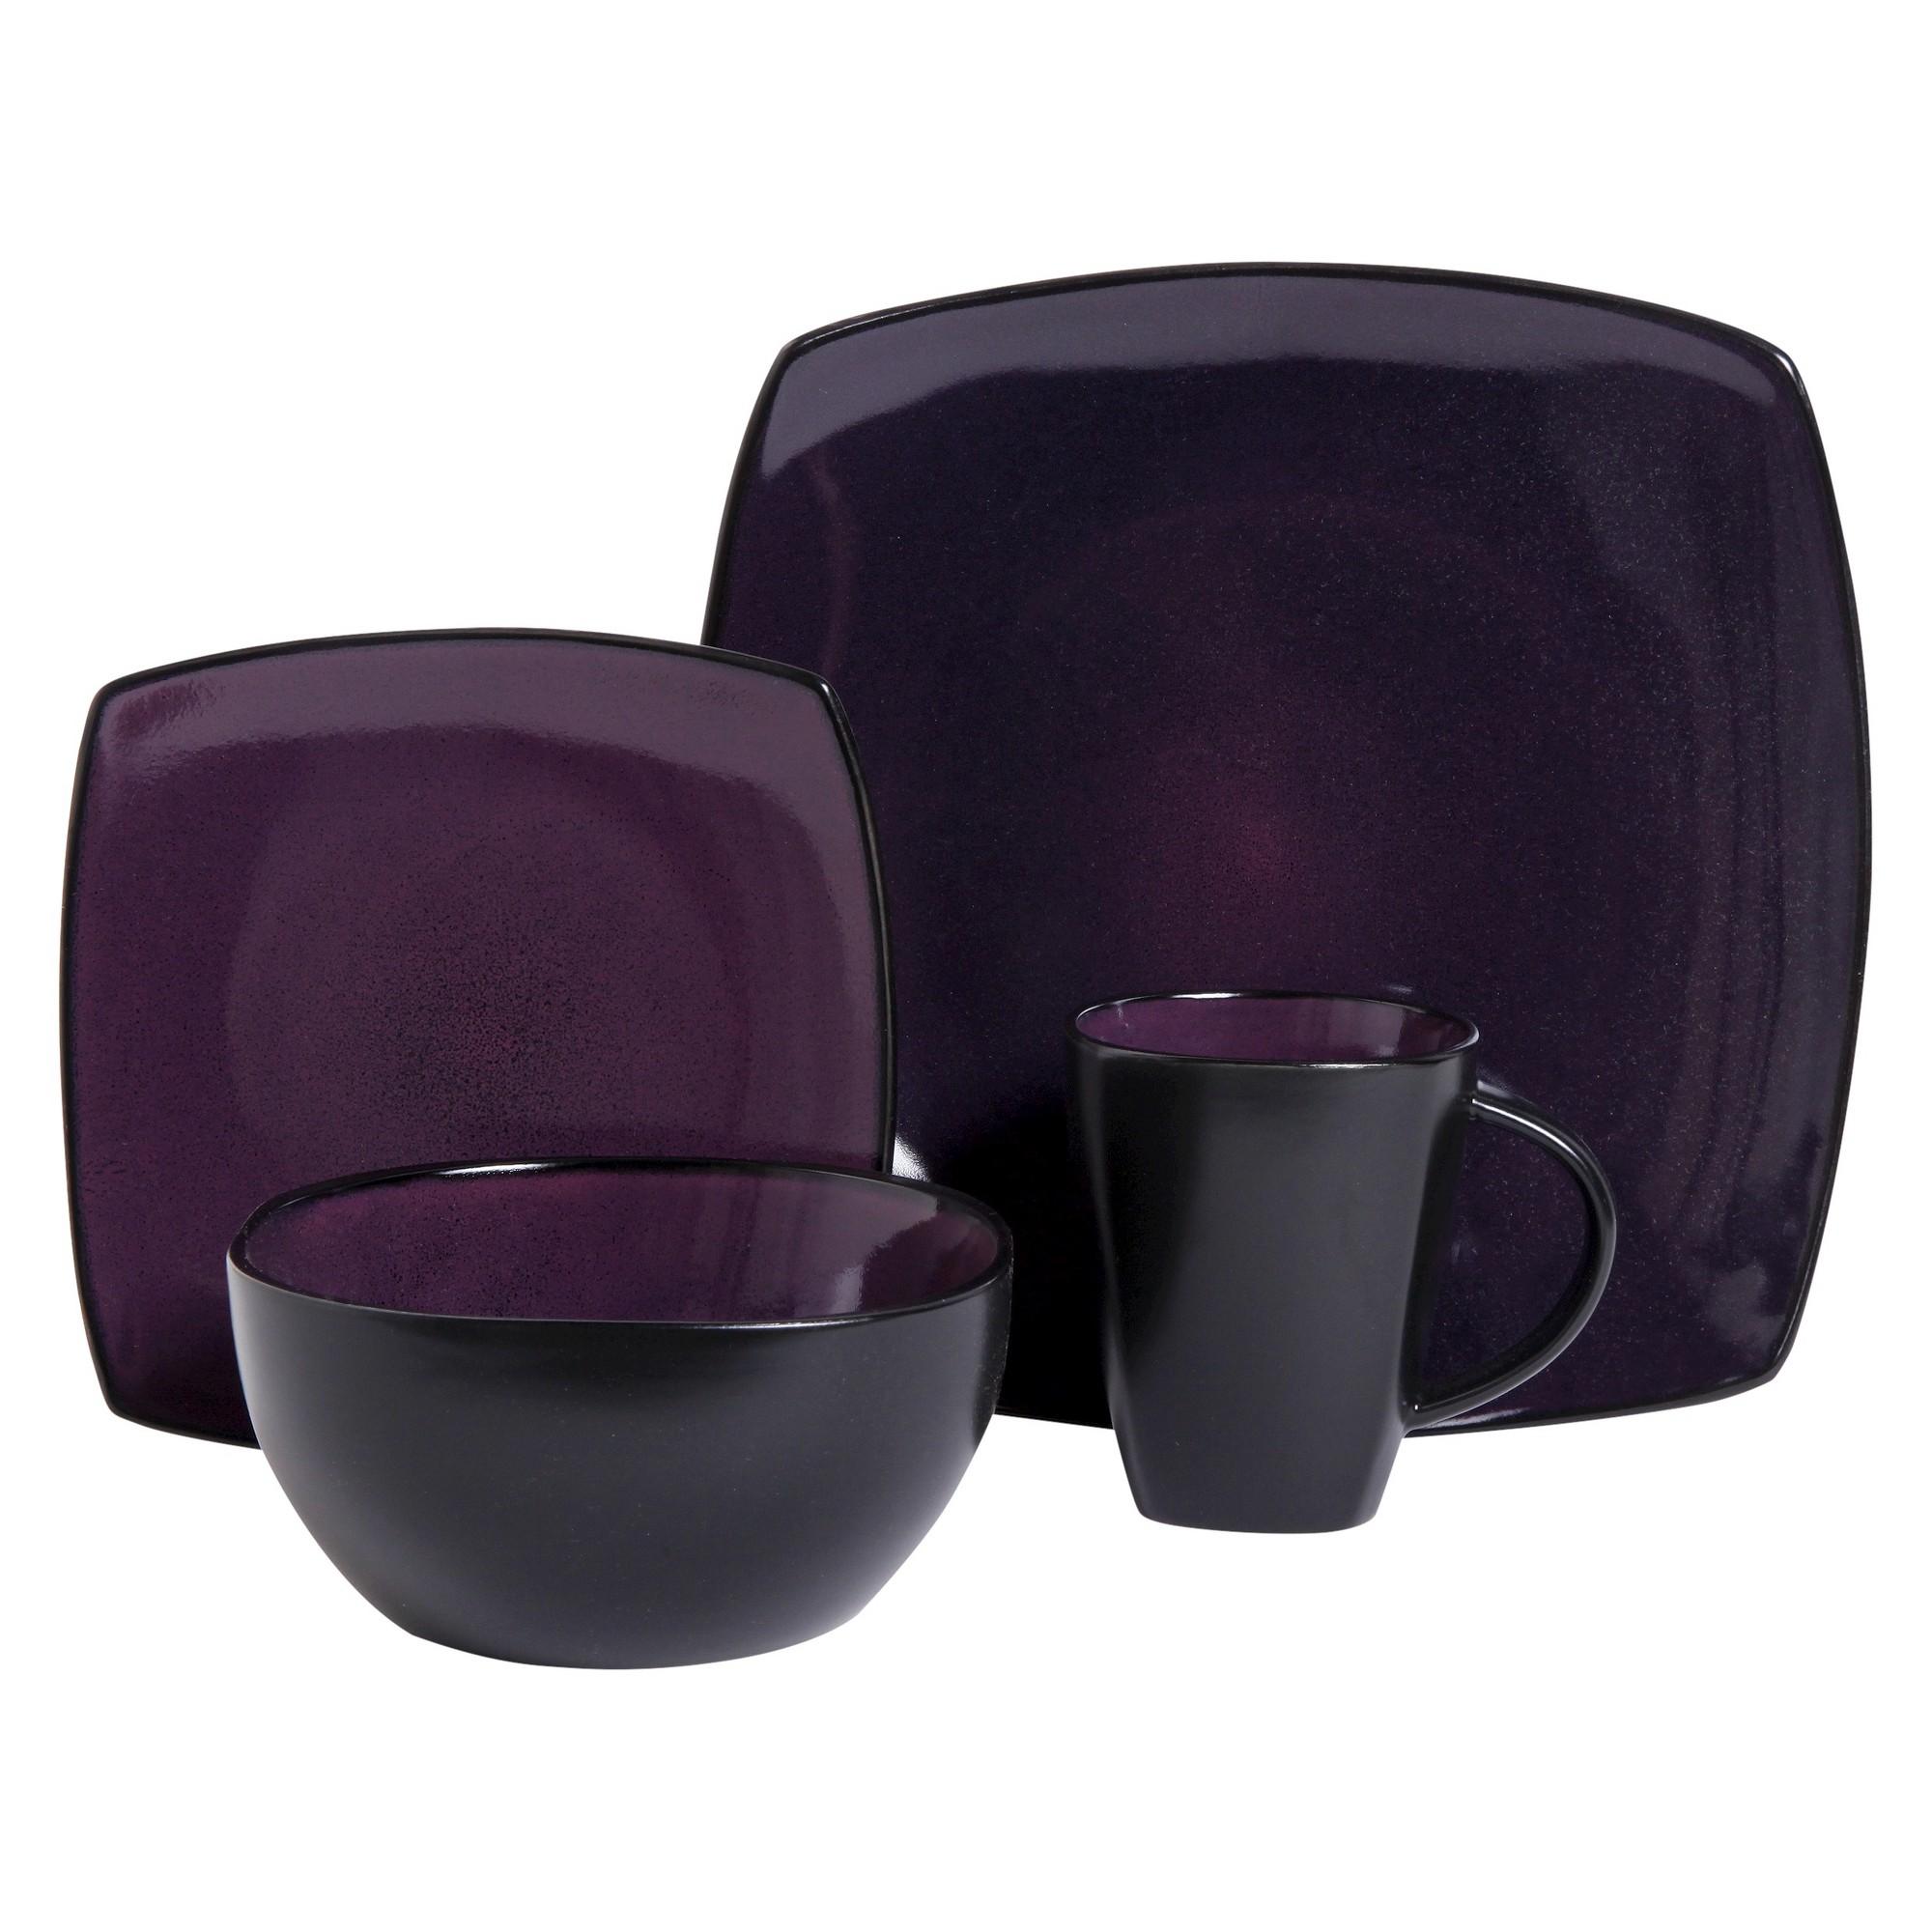 Gibson Tocata Lounge 16pc Dinnerware Set Plum  sc 1 st  Pinterest & Gibson Tocata Lounge 16pc Dinnerware Set Plum (Purple) | Dinnerware ...